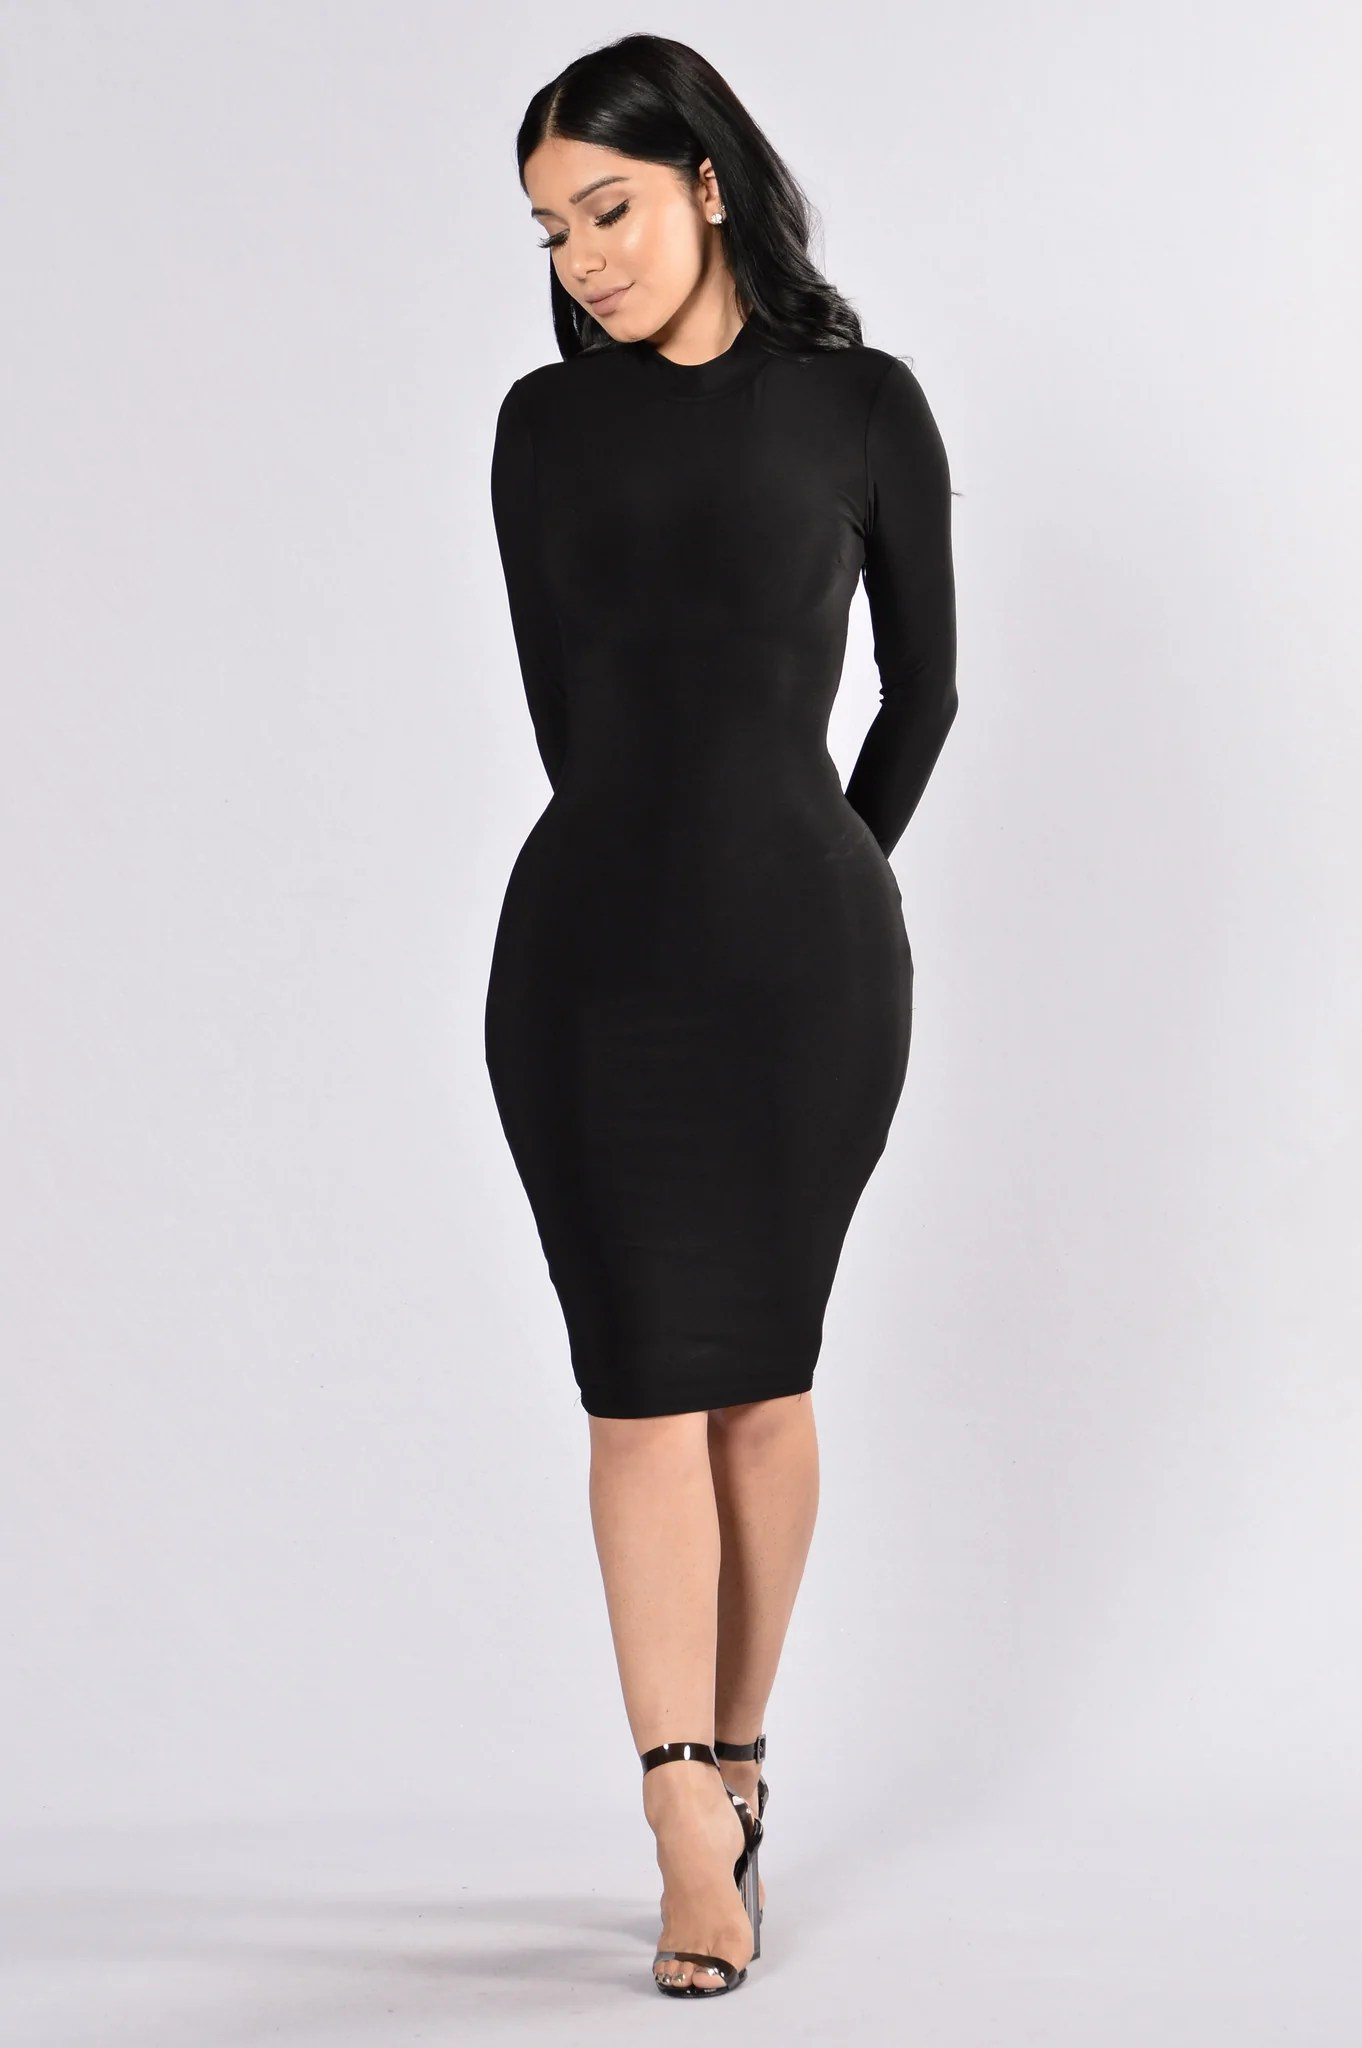 High On Life Dress - Black